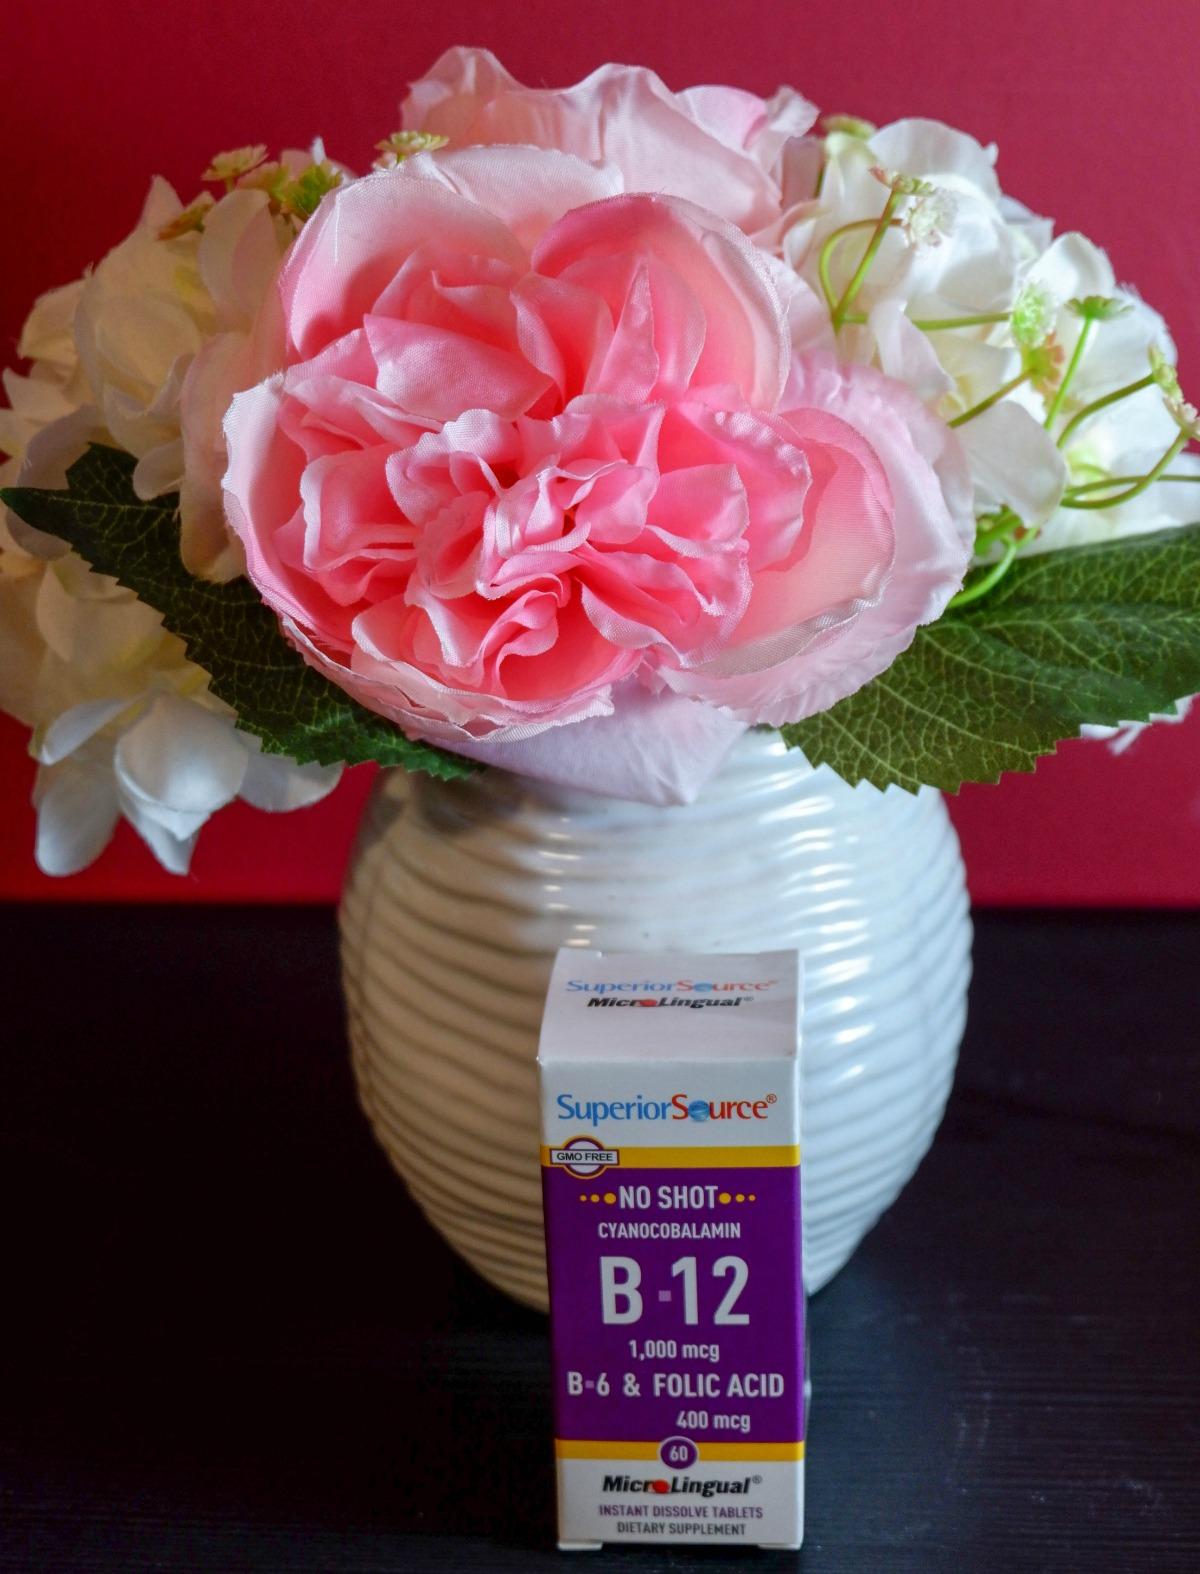 Superior Source Vitamins B-12